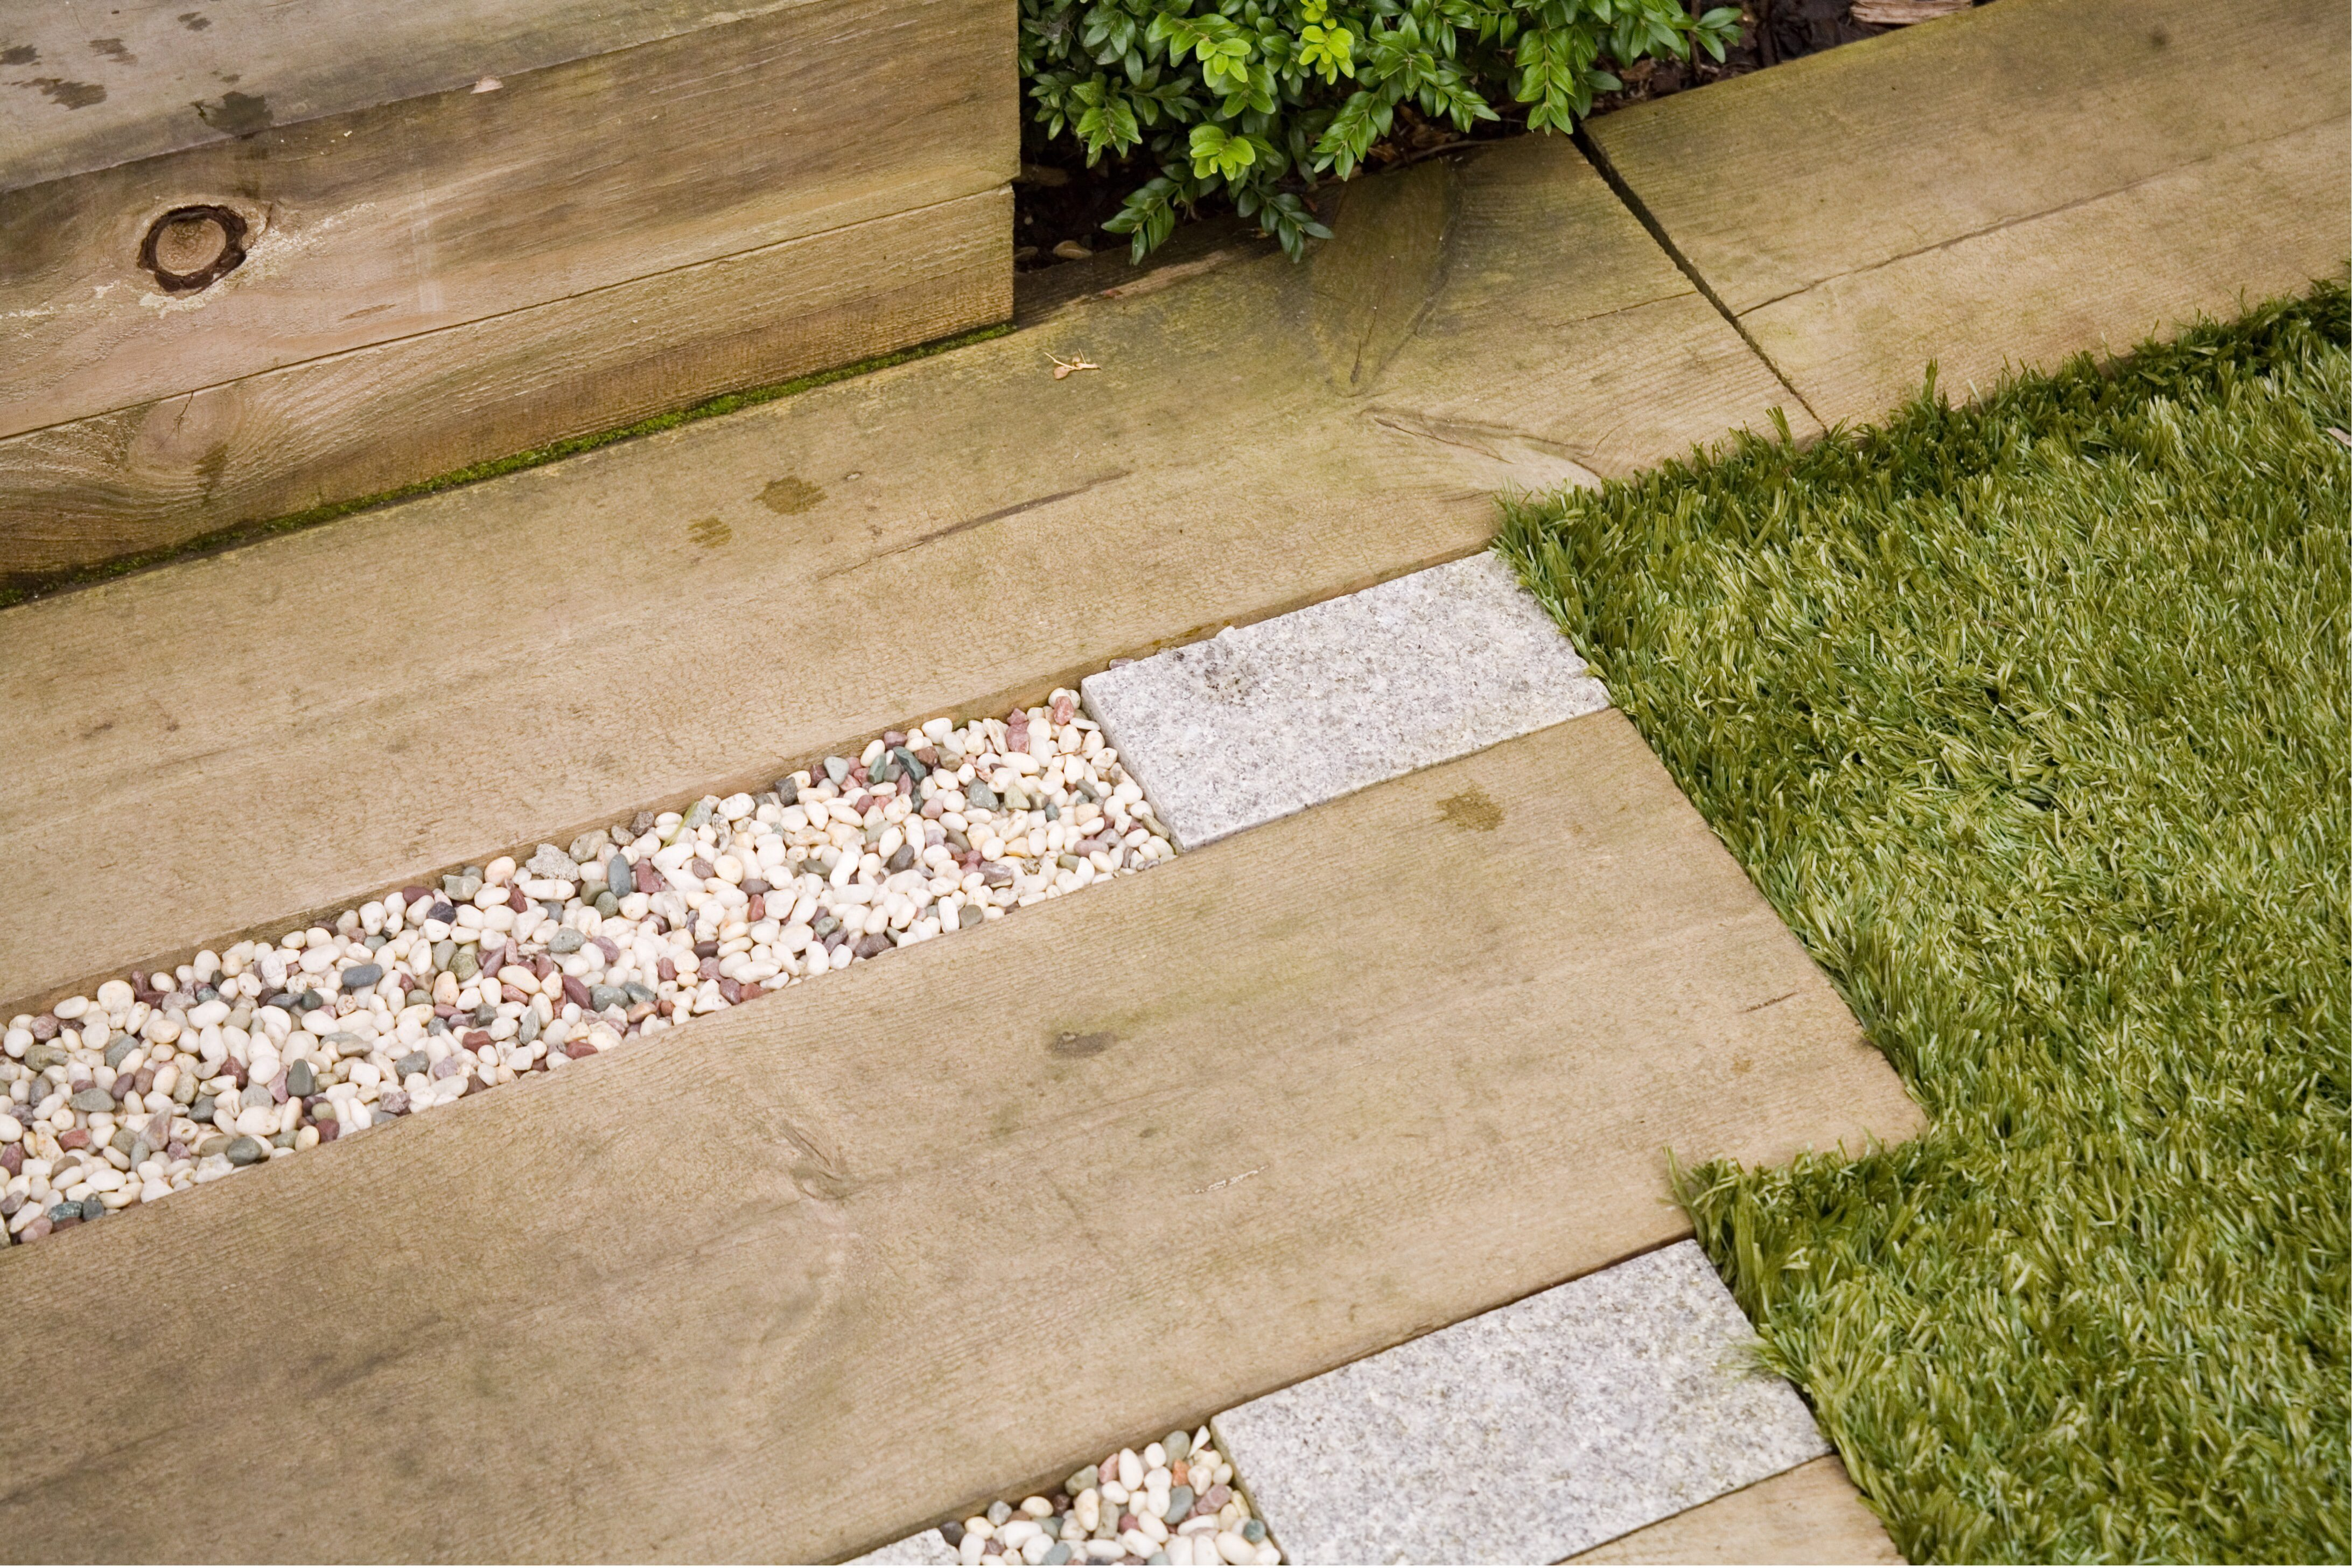 Garden Design Tips Railway Sleepers - can be used on the floor